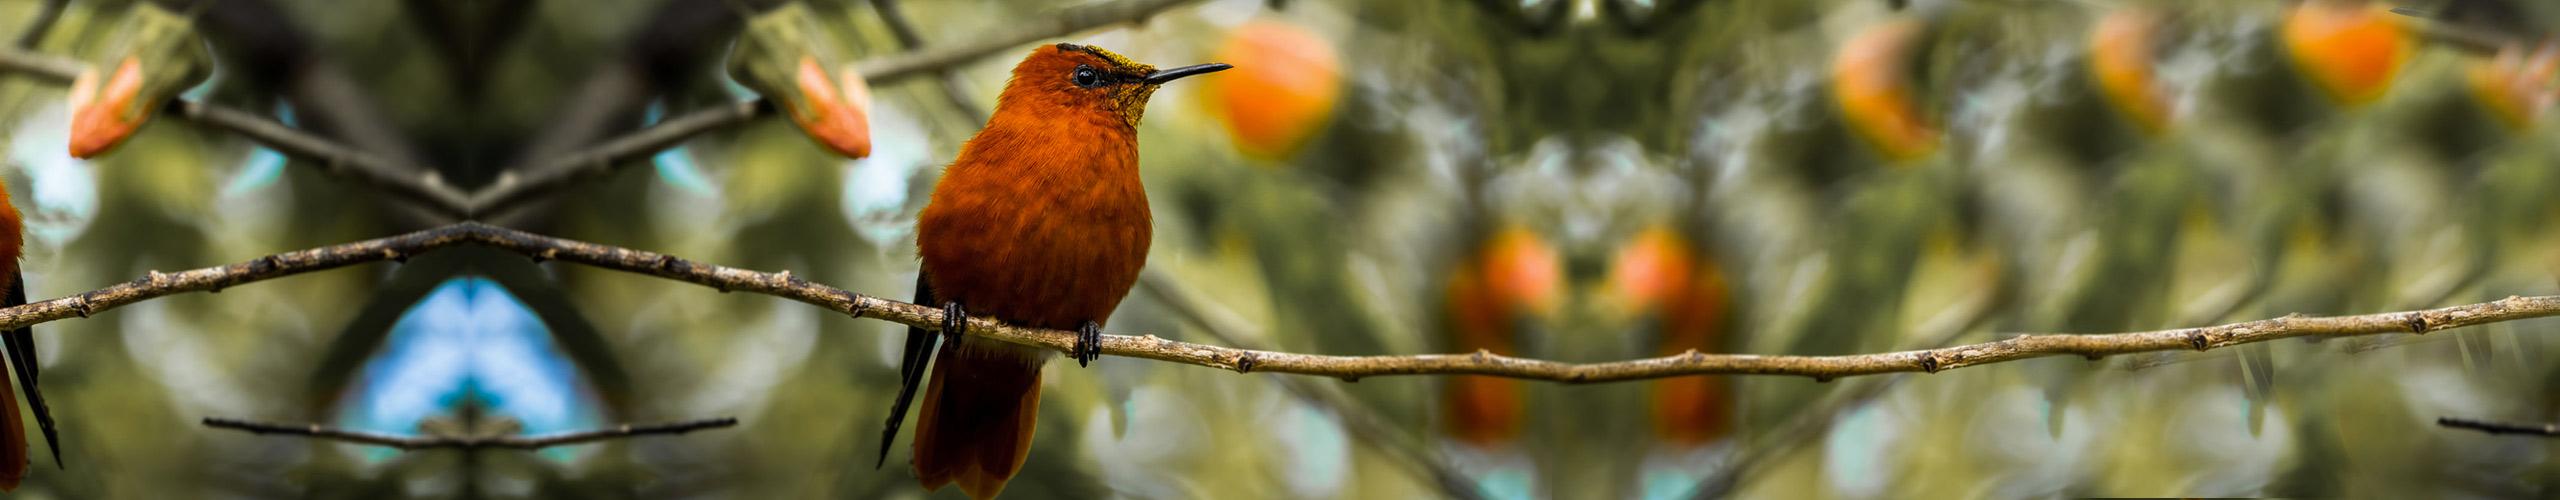 Juan fernandez firecrown island conservation chile preventing extinctions